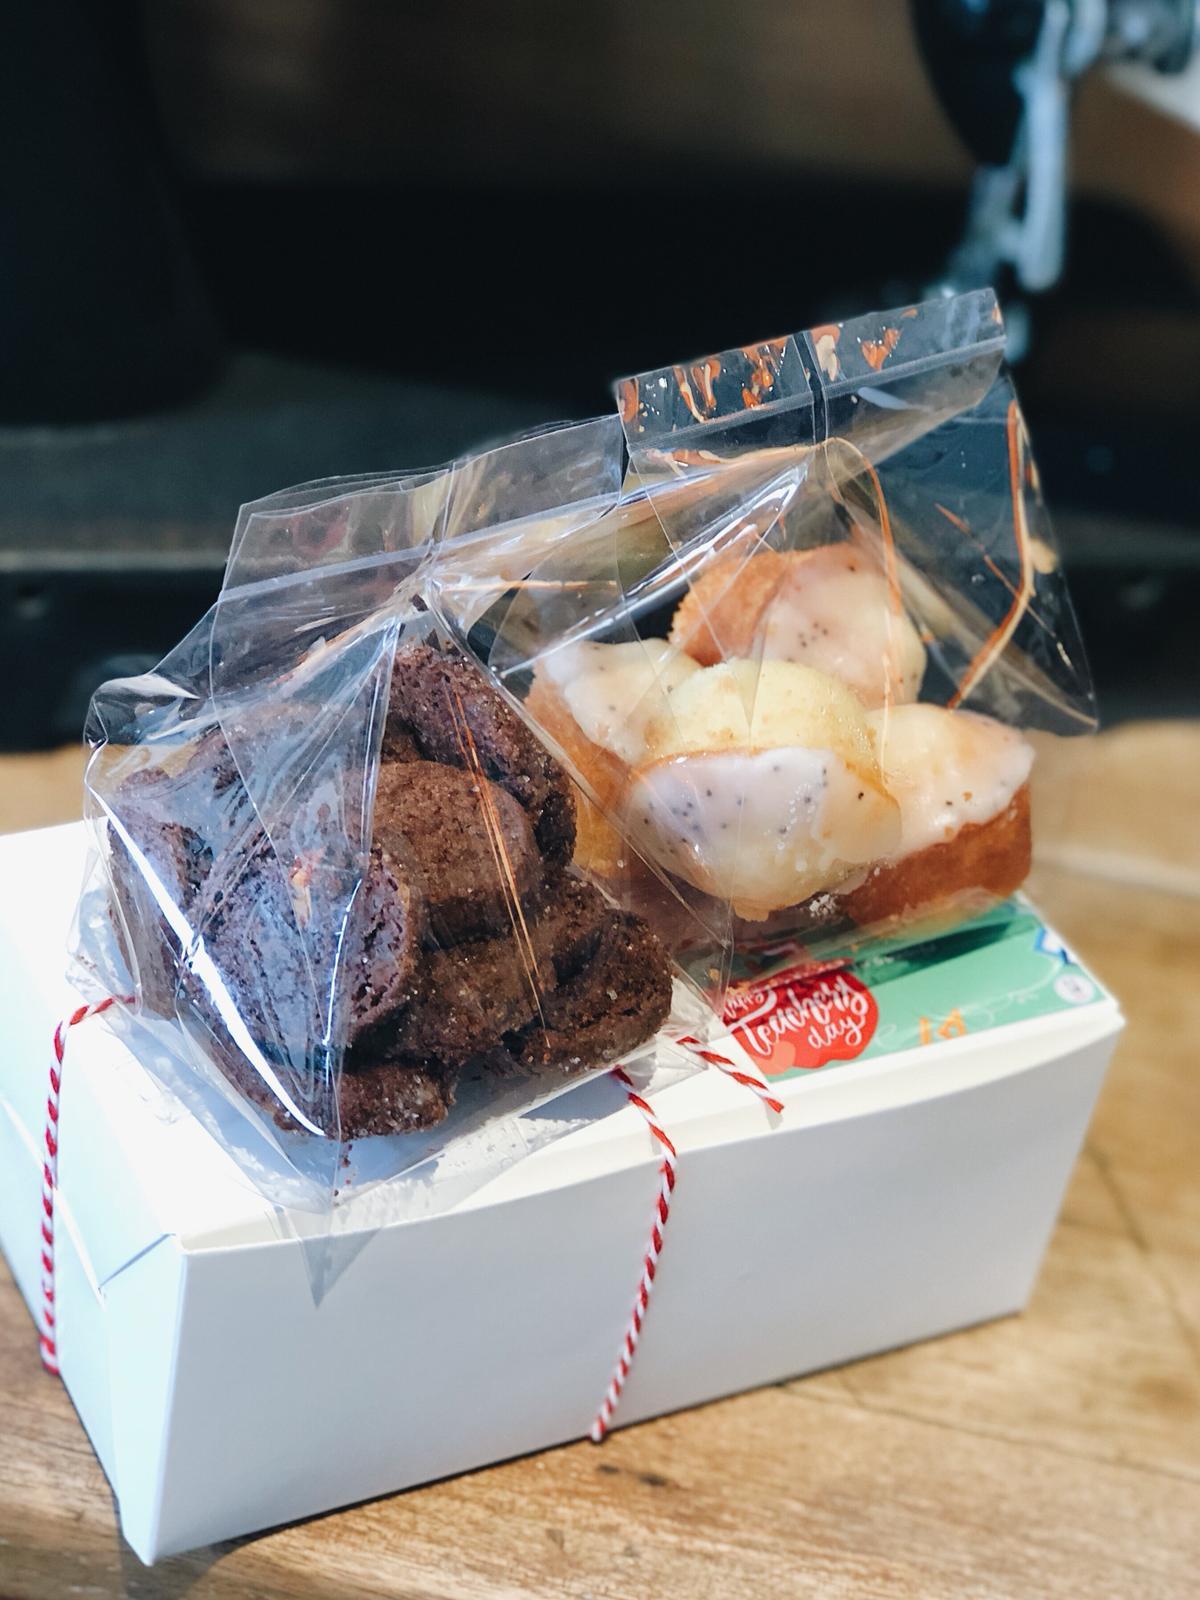 Teacher's Day Gift (Chocolate Sea Salt S